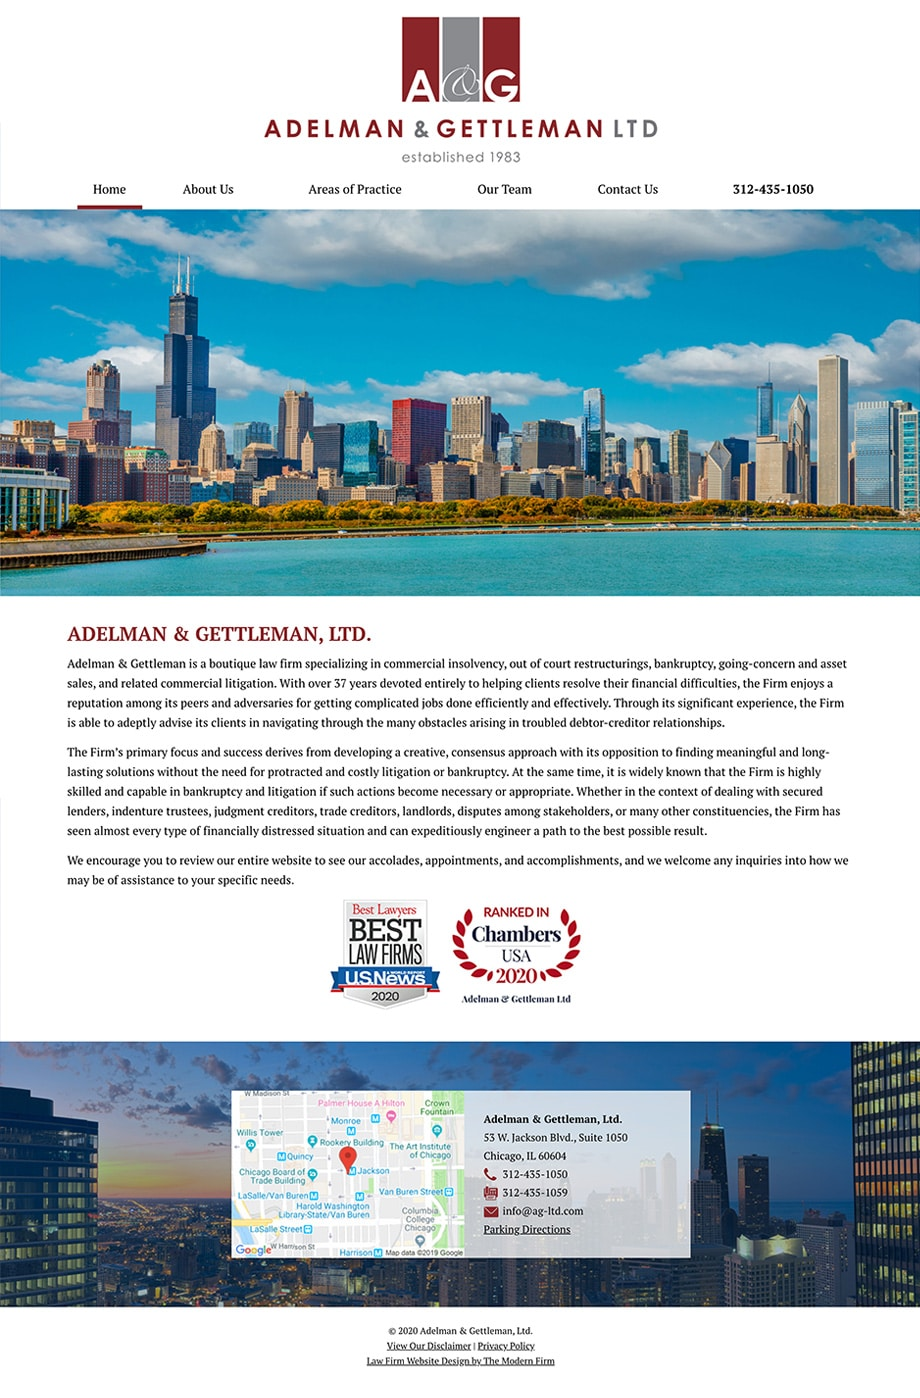 Law Firm Website Design for Adelman & Gettleman, Ltd.